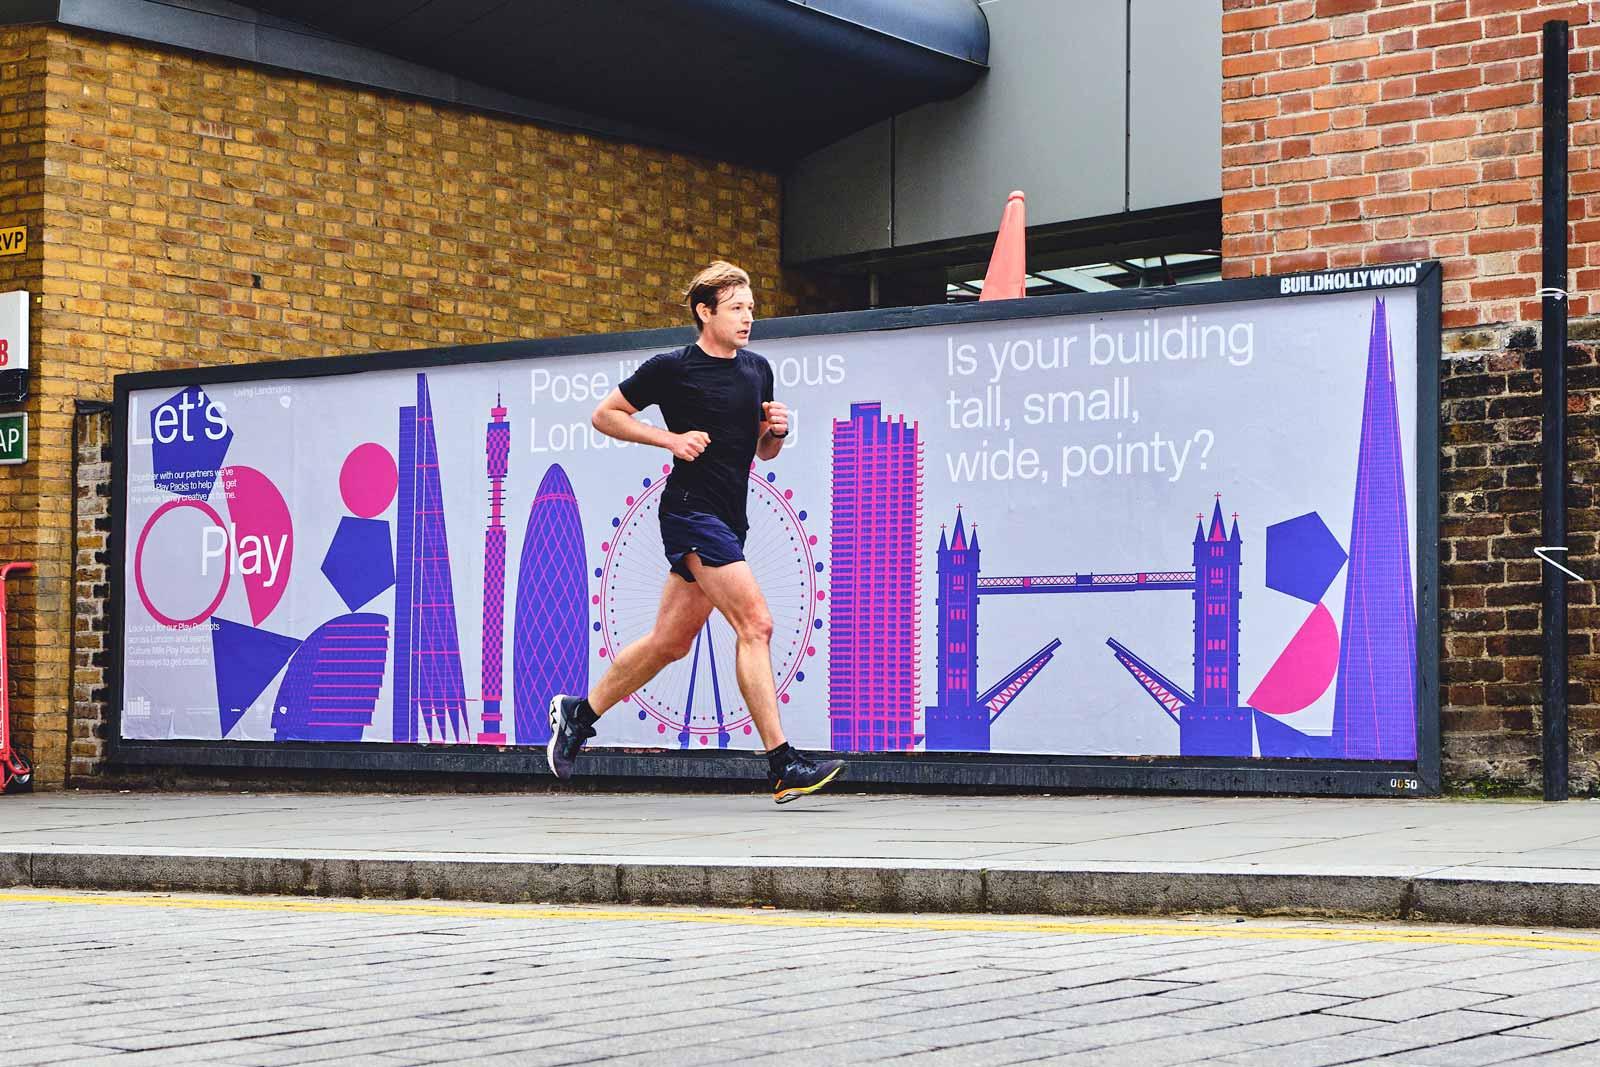 Man running past play packs billboard in the street